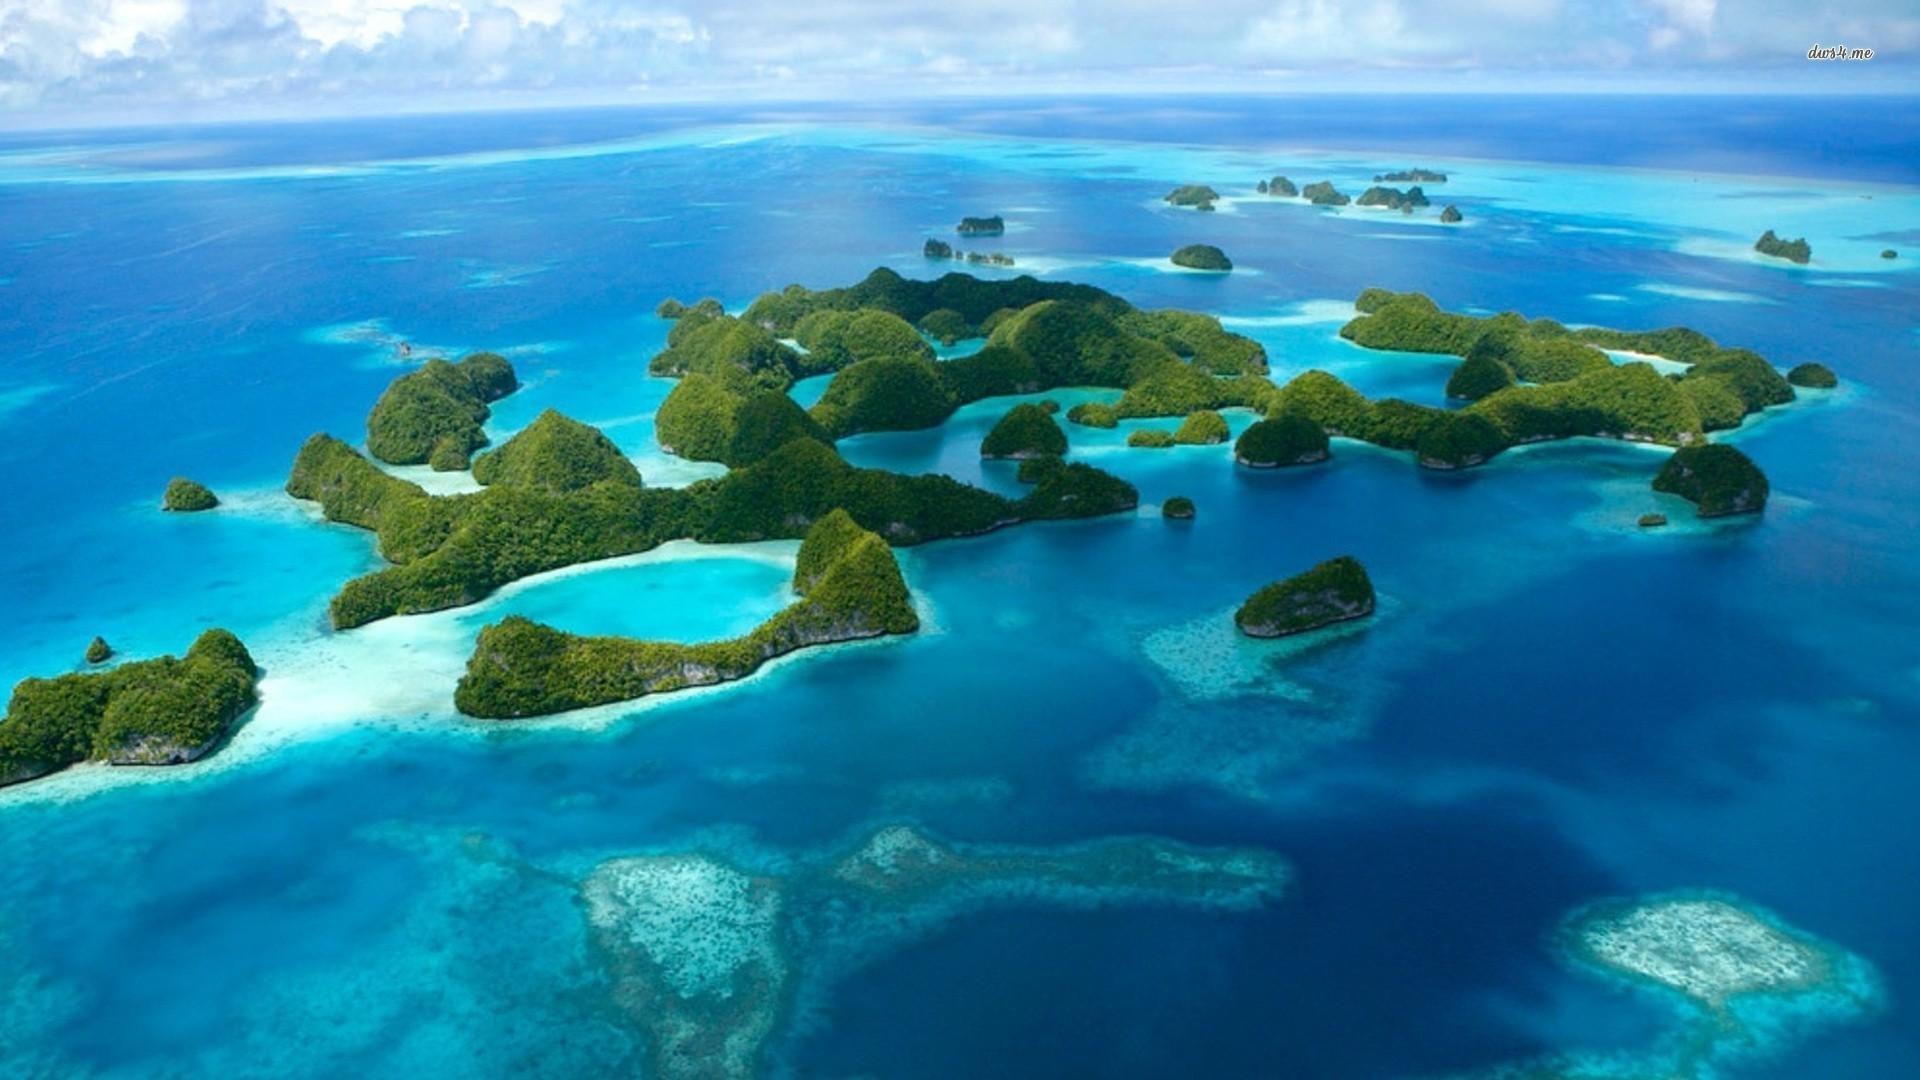 palau islands thailand desktop backgrounds for free hd wallpaper